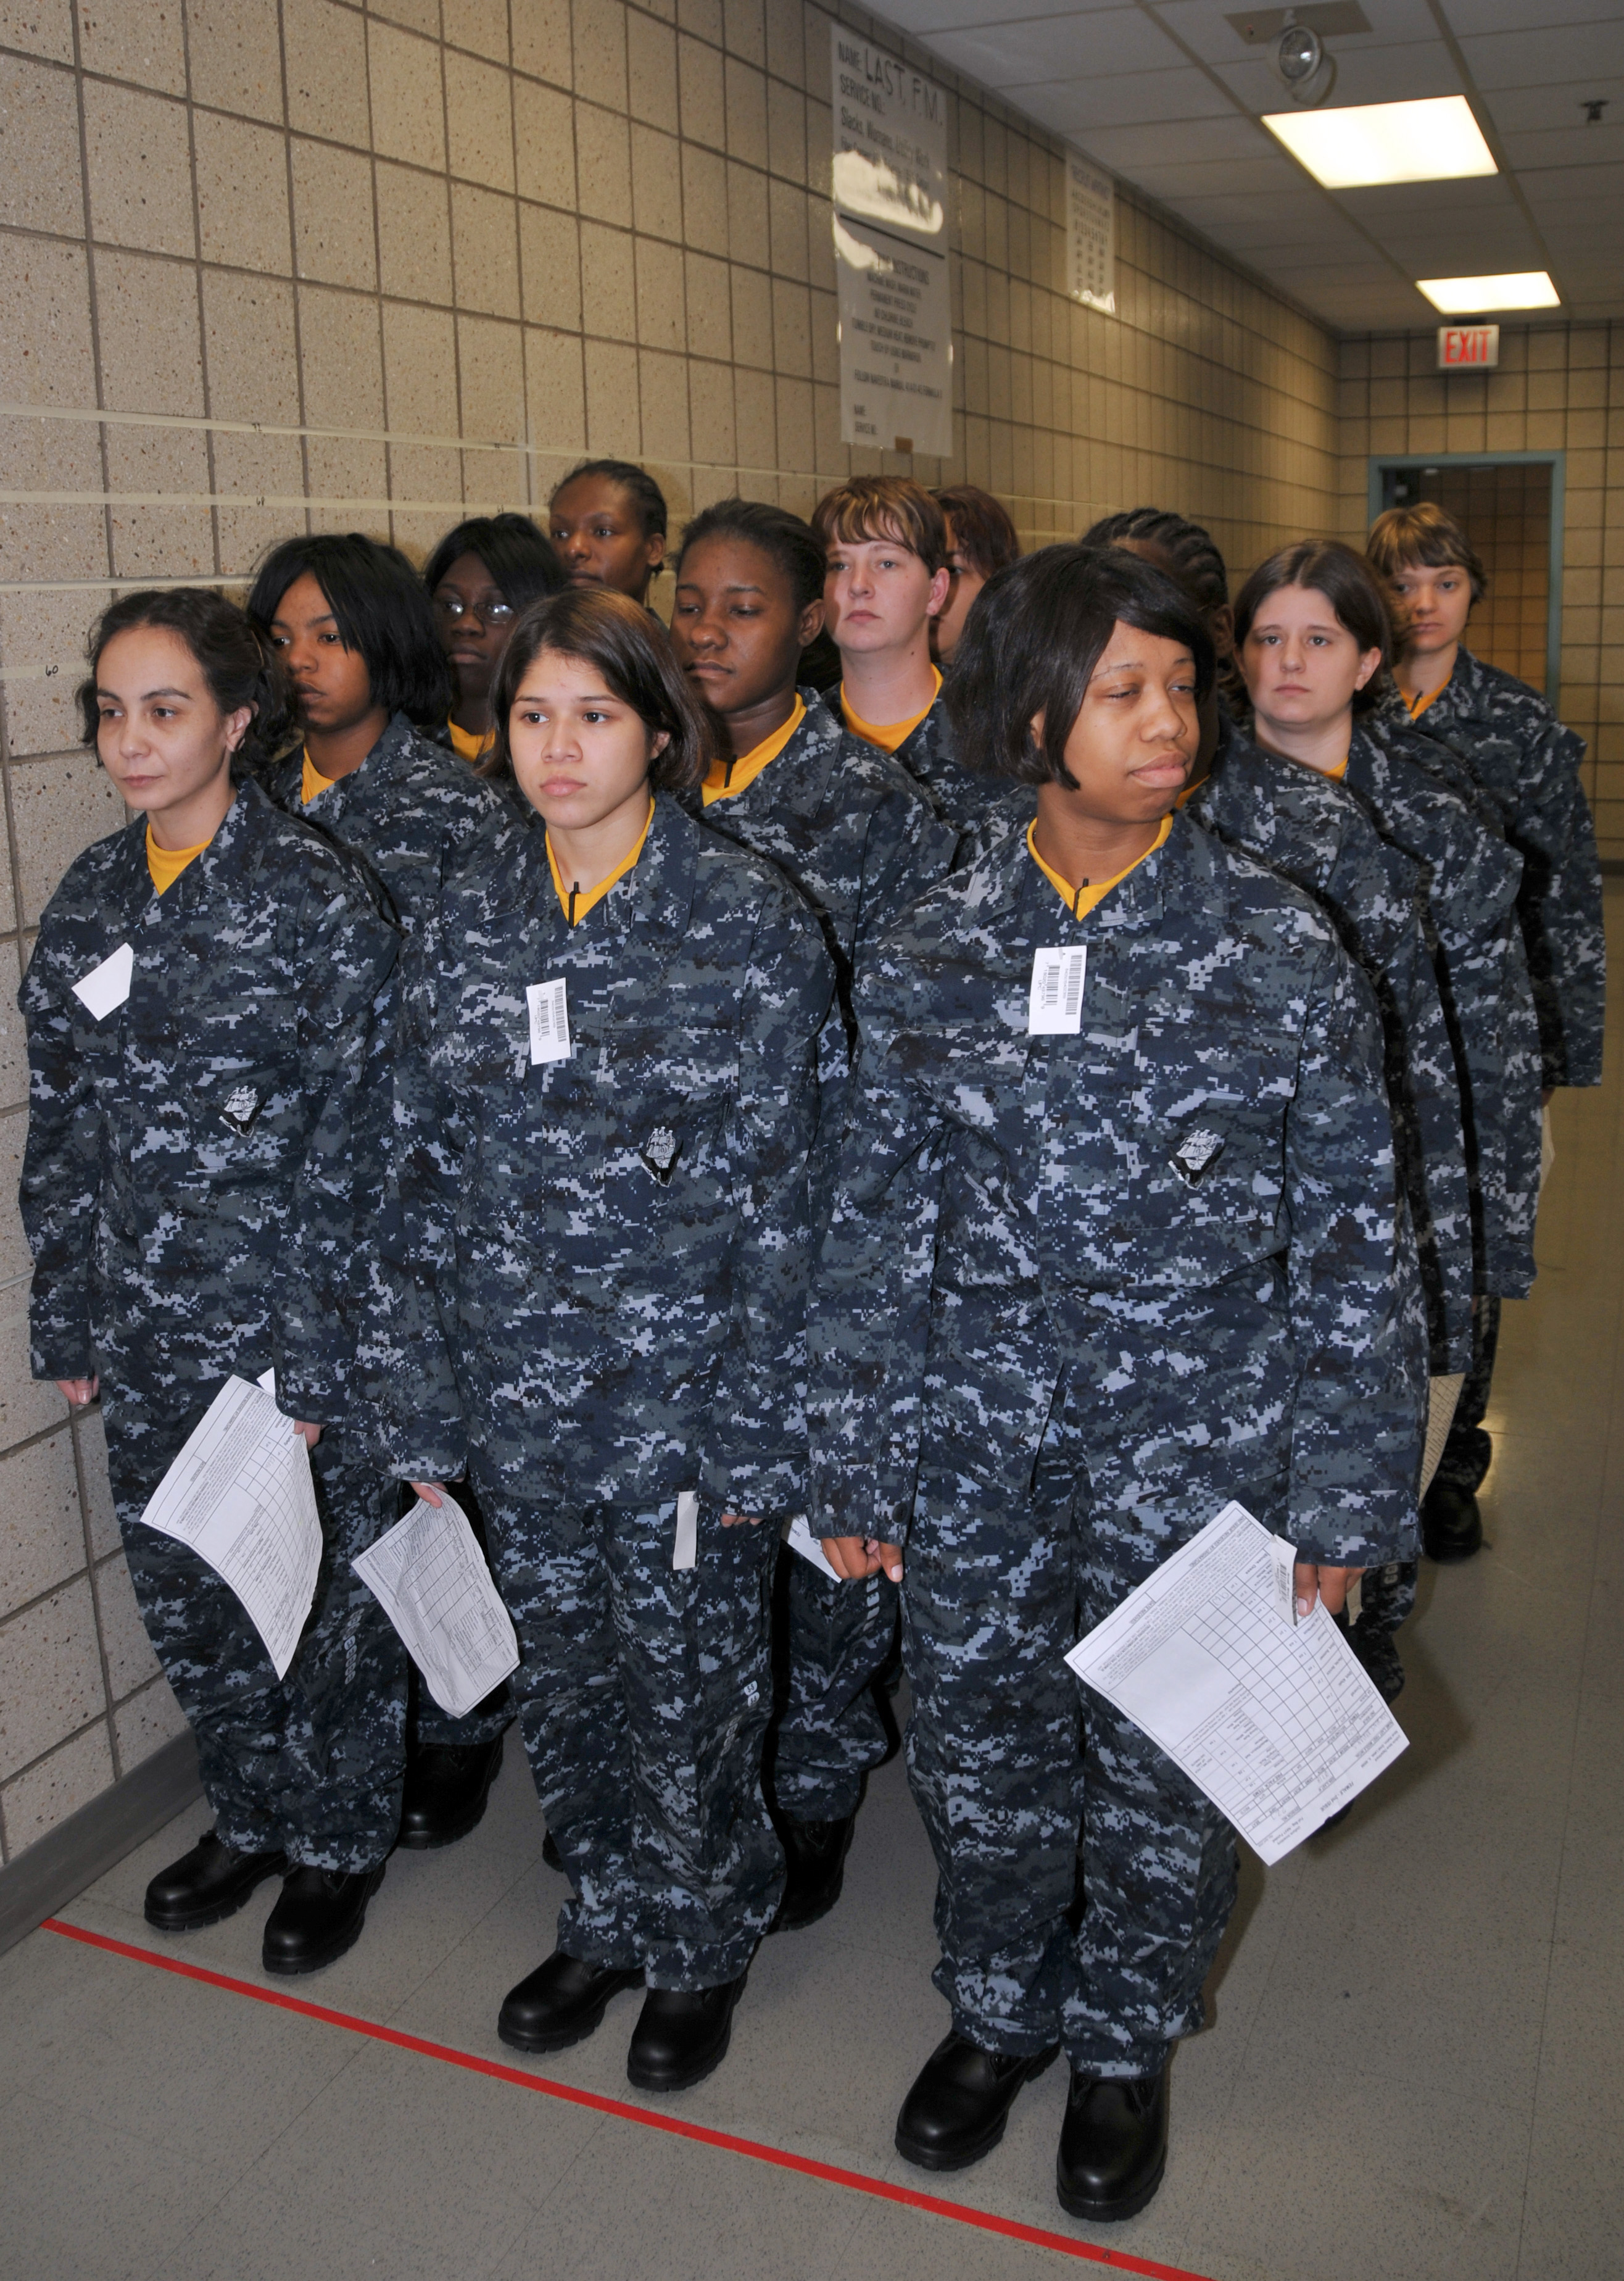 All US Navy Uniforms